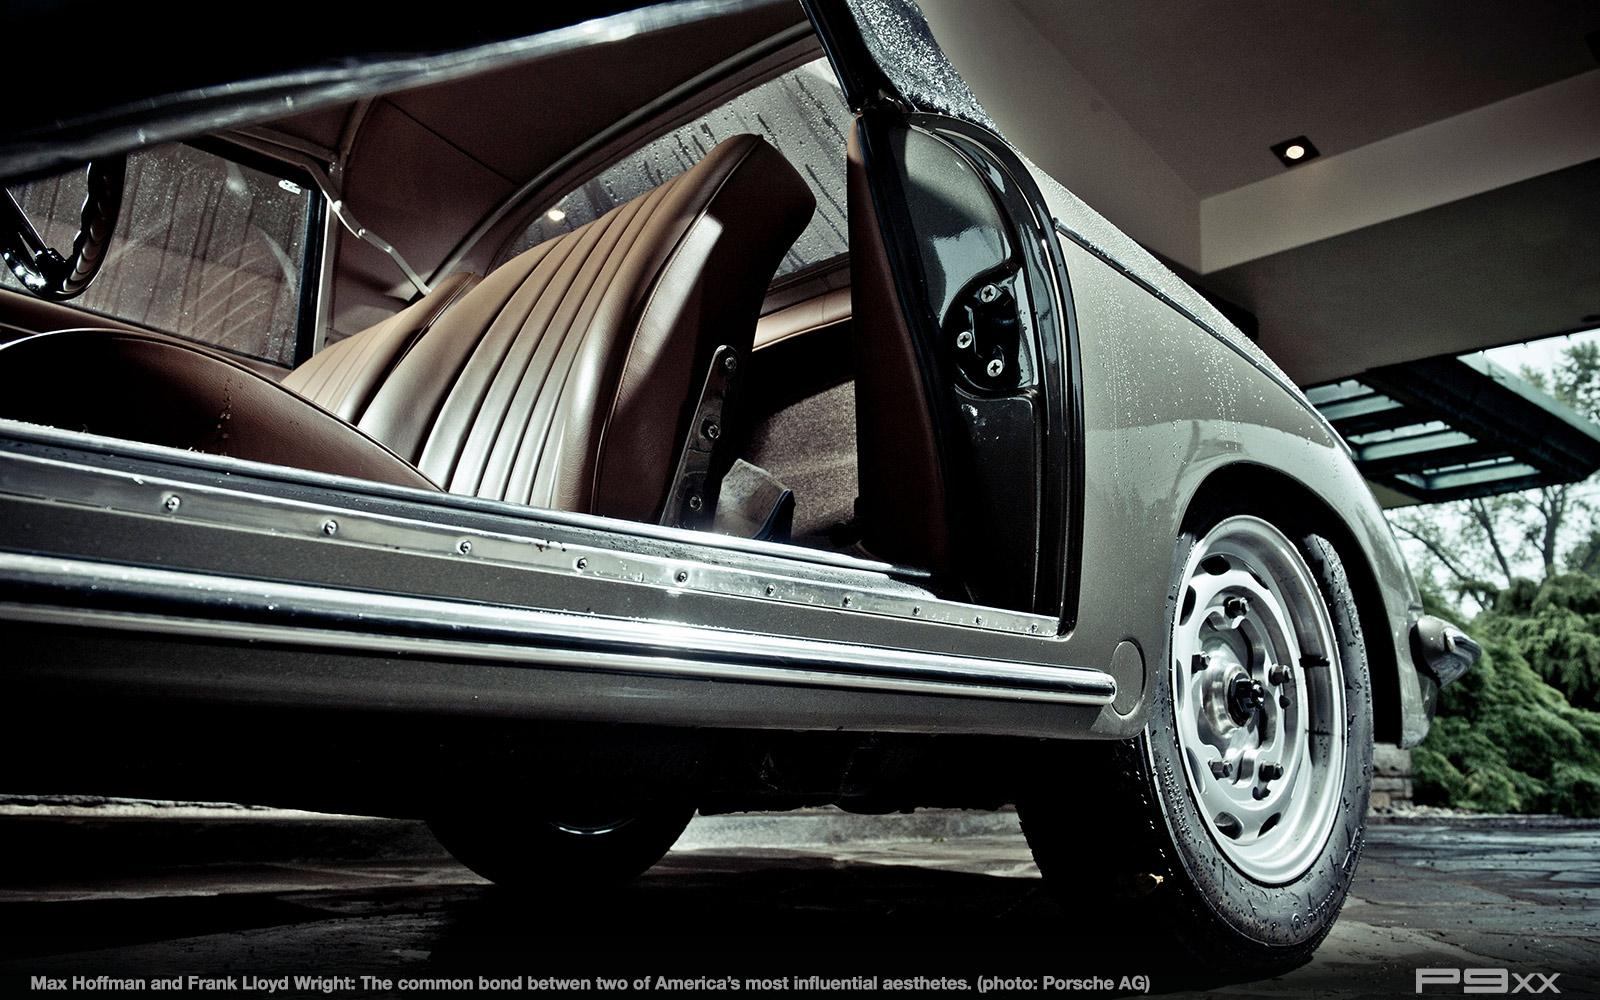 Max-Hoffman-Frank-Lloyd-Wright-Porsche-356-327